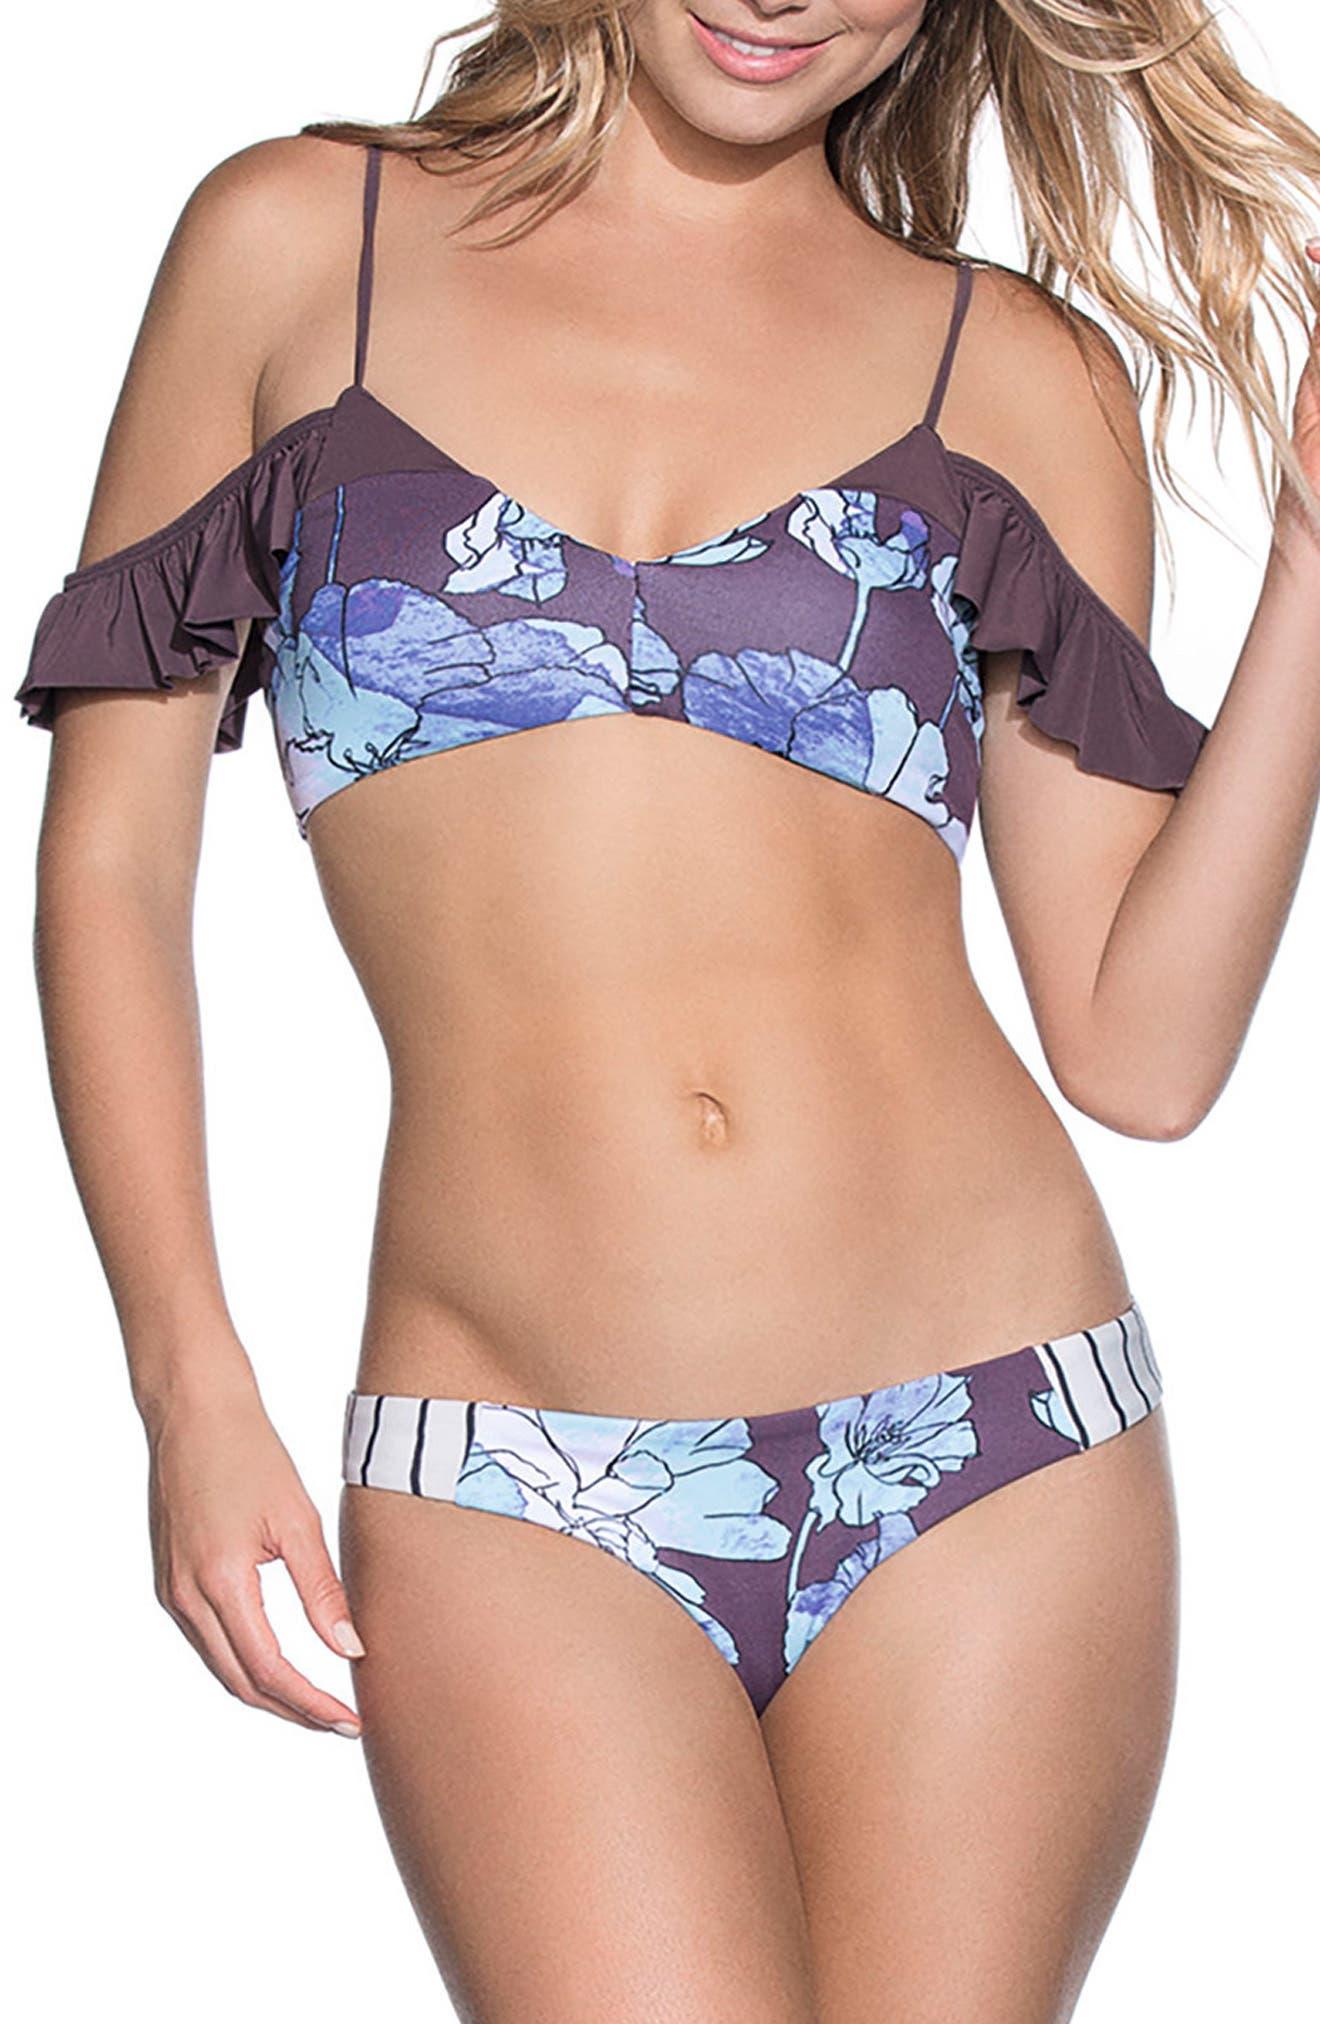 Sierra Nevada Off the Shoulder Reversible Bikini Top,                             Alternate thumbnail 3, color,                             500